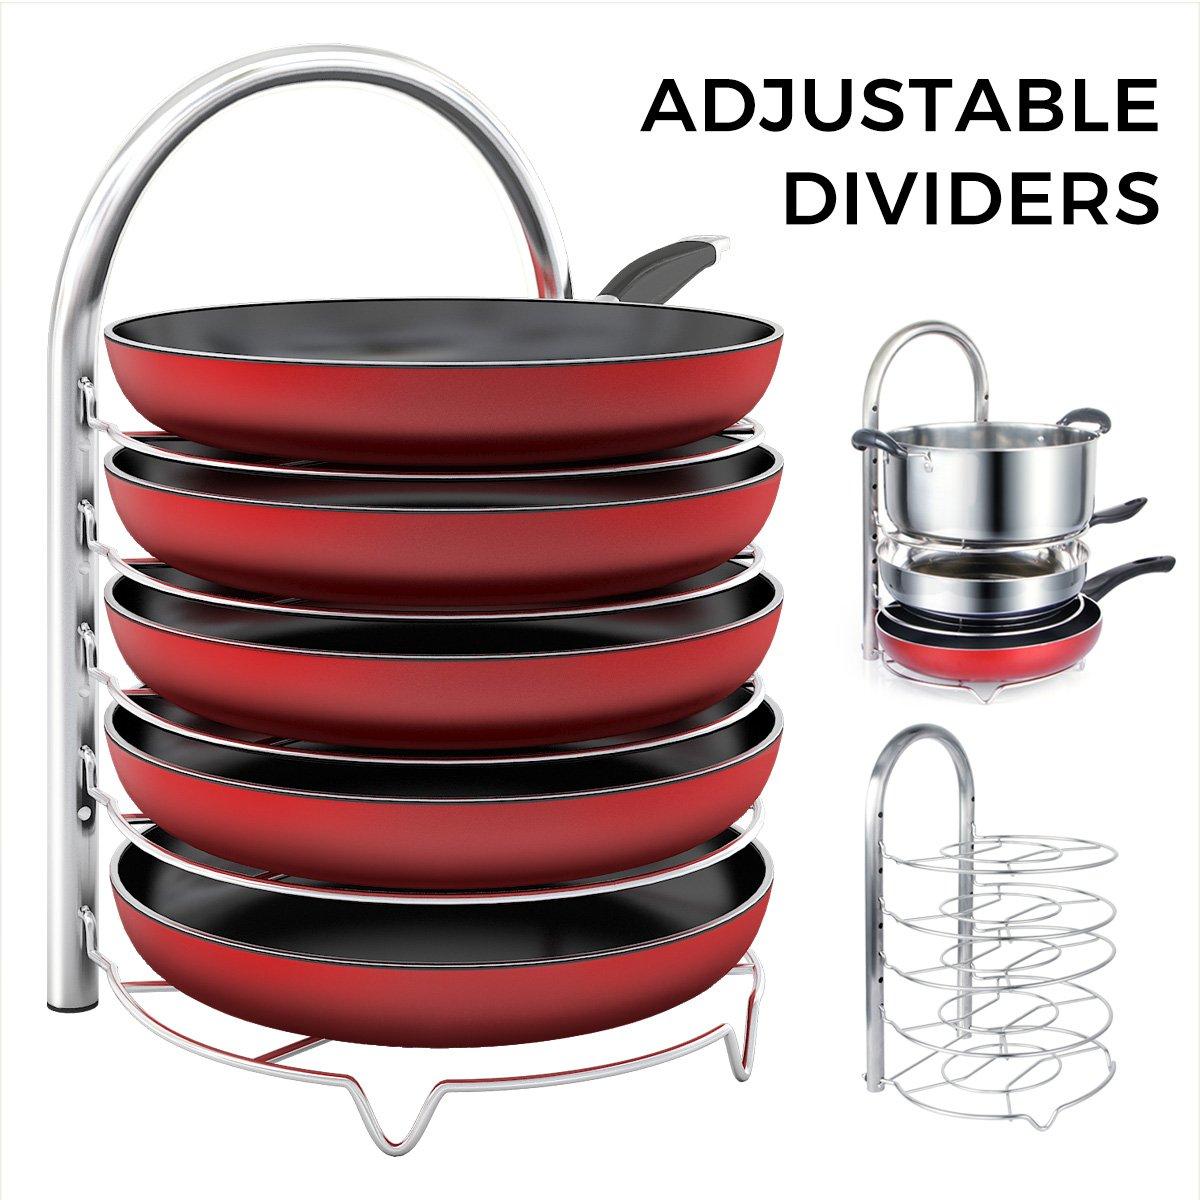 5-Tier Adjustable Stainless Steel Pan/Pot Organizer, $16.99